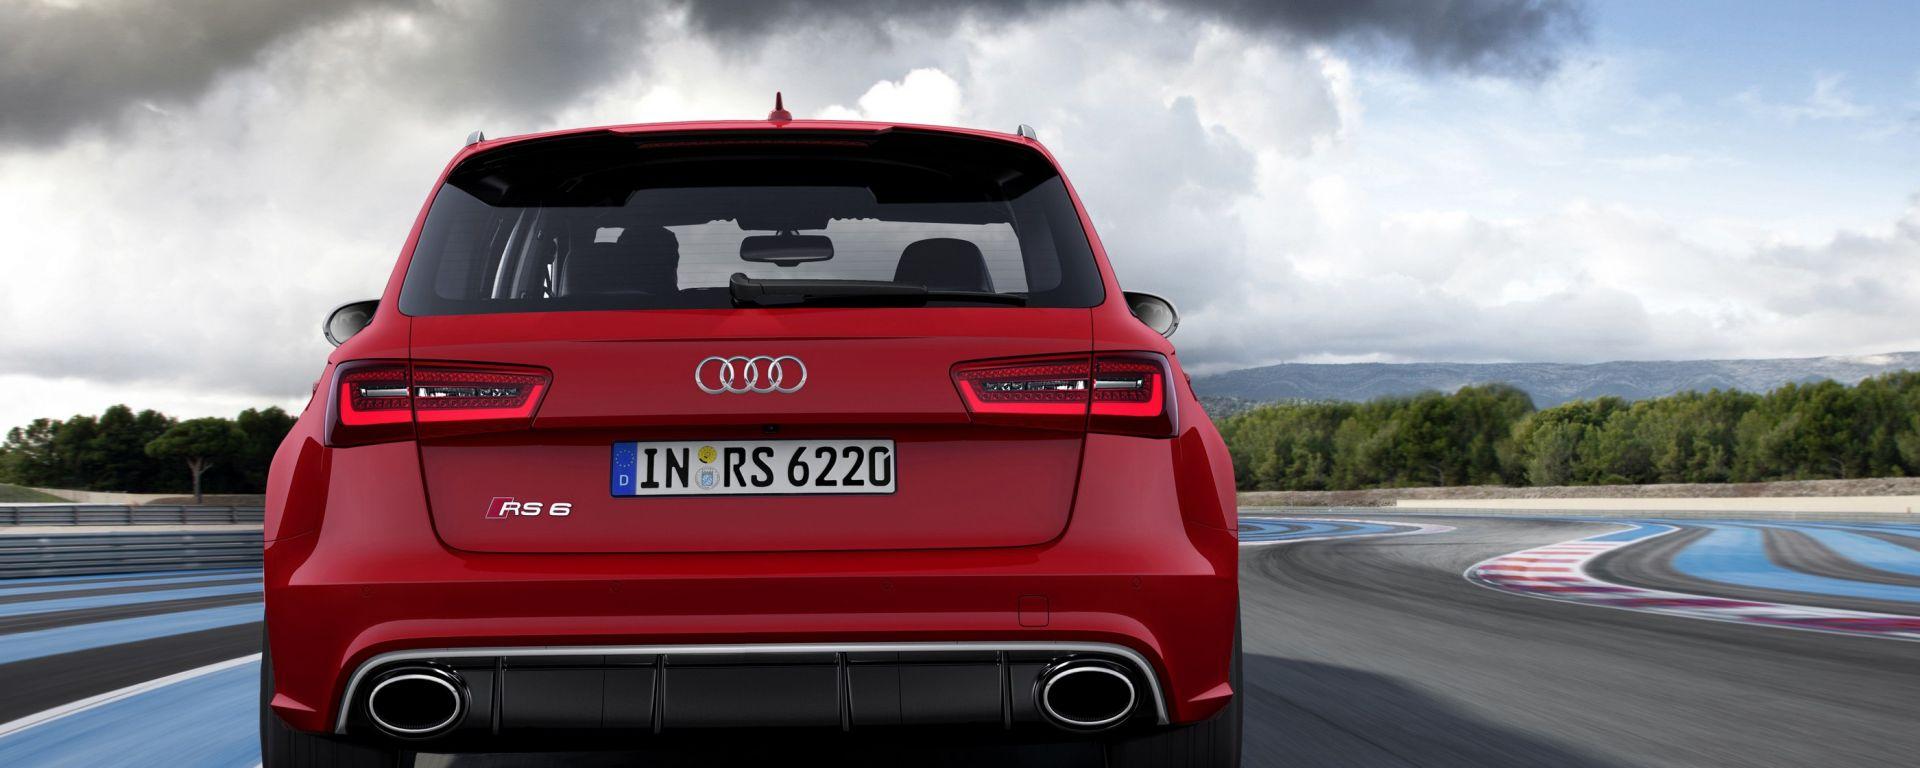 Audi RS 6 Avant 2013